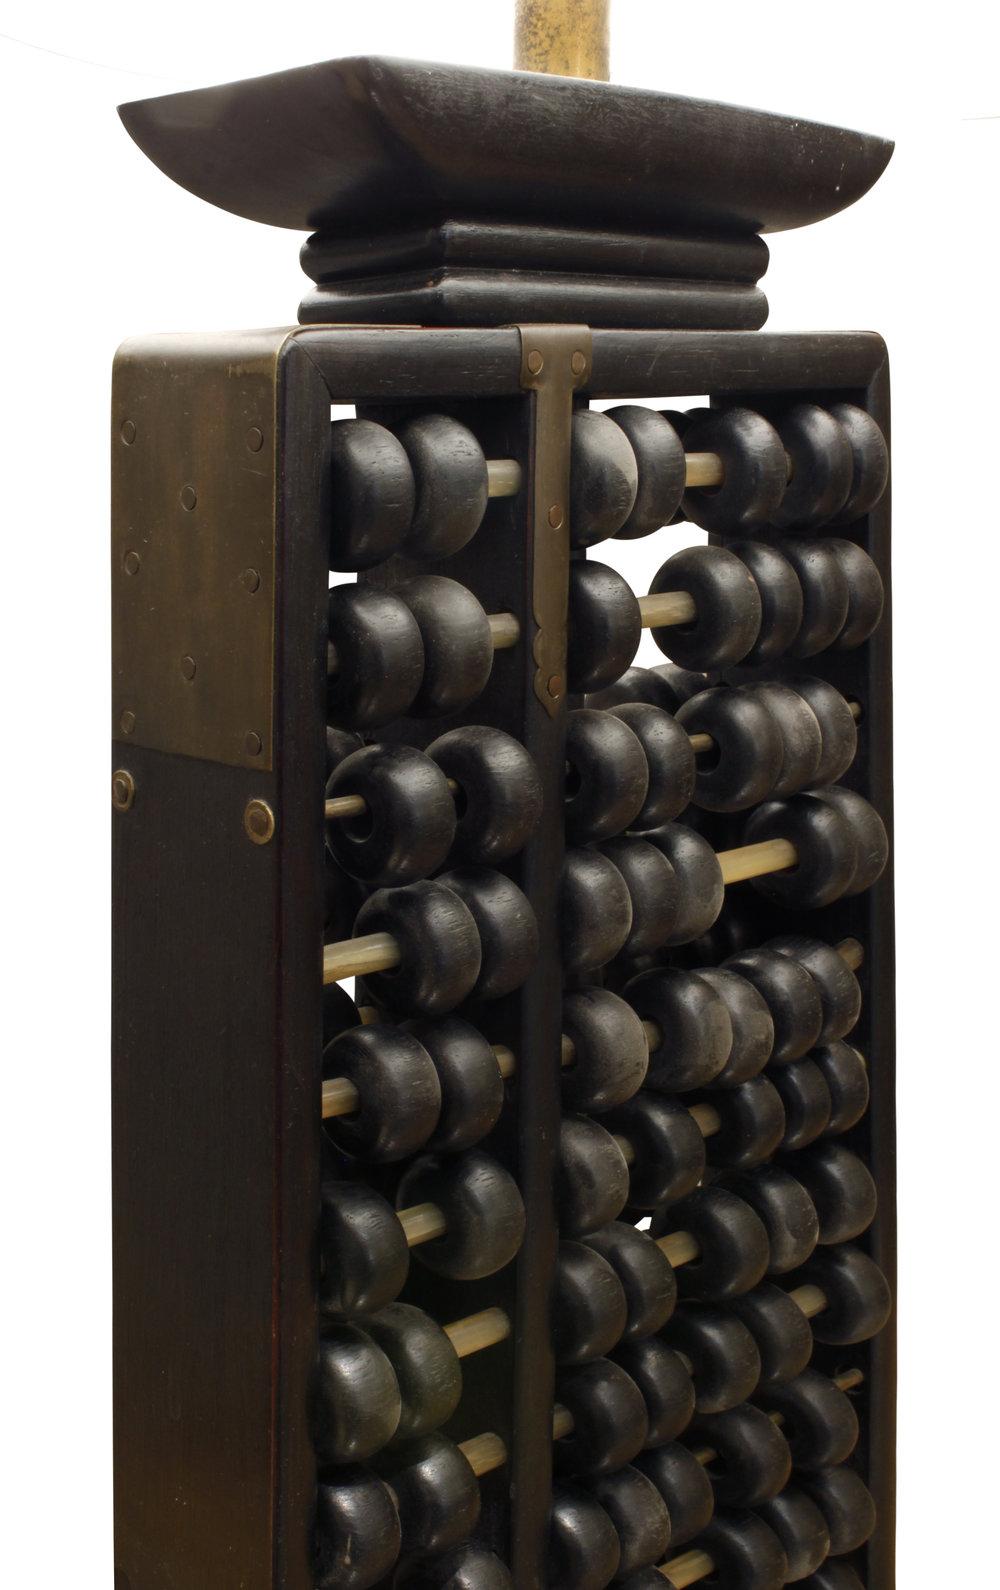 Abacus 25 1940s tablelamp96 agl dtl.JPG